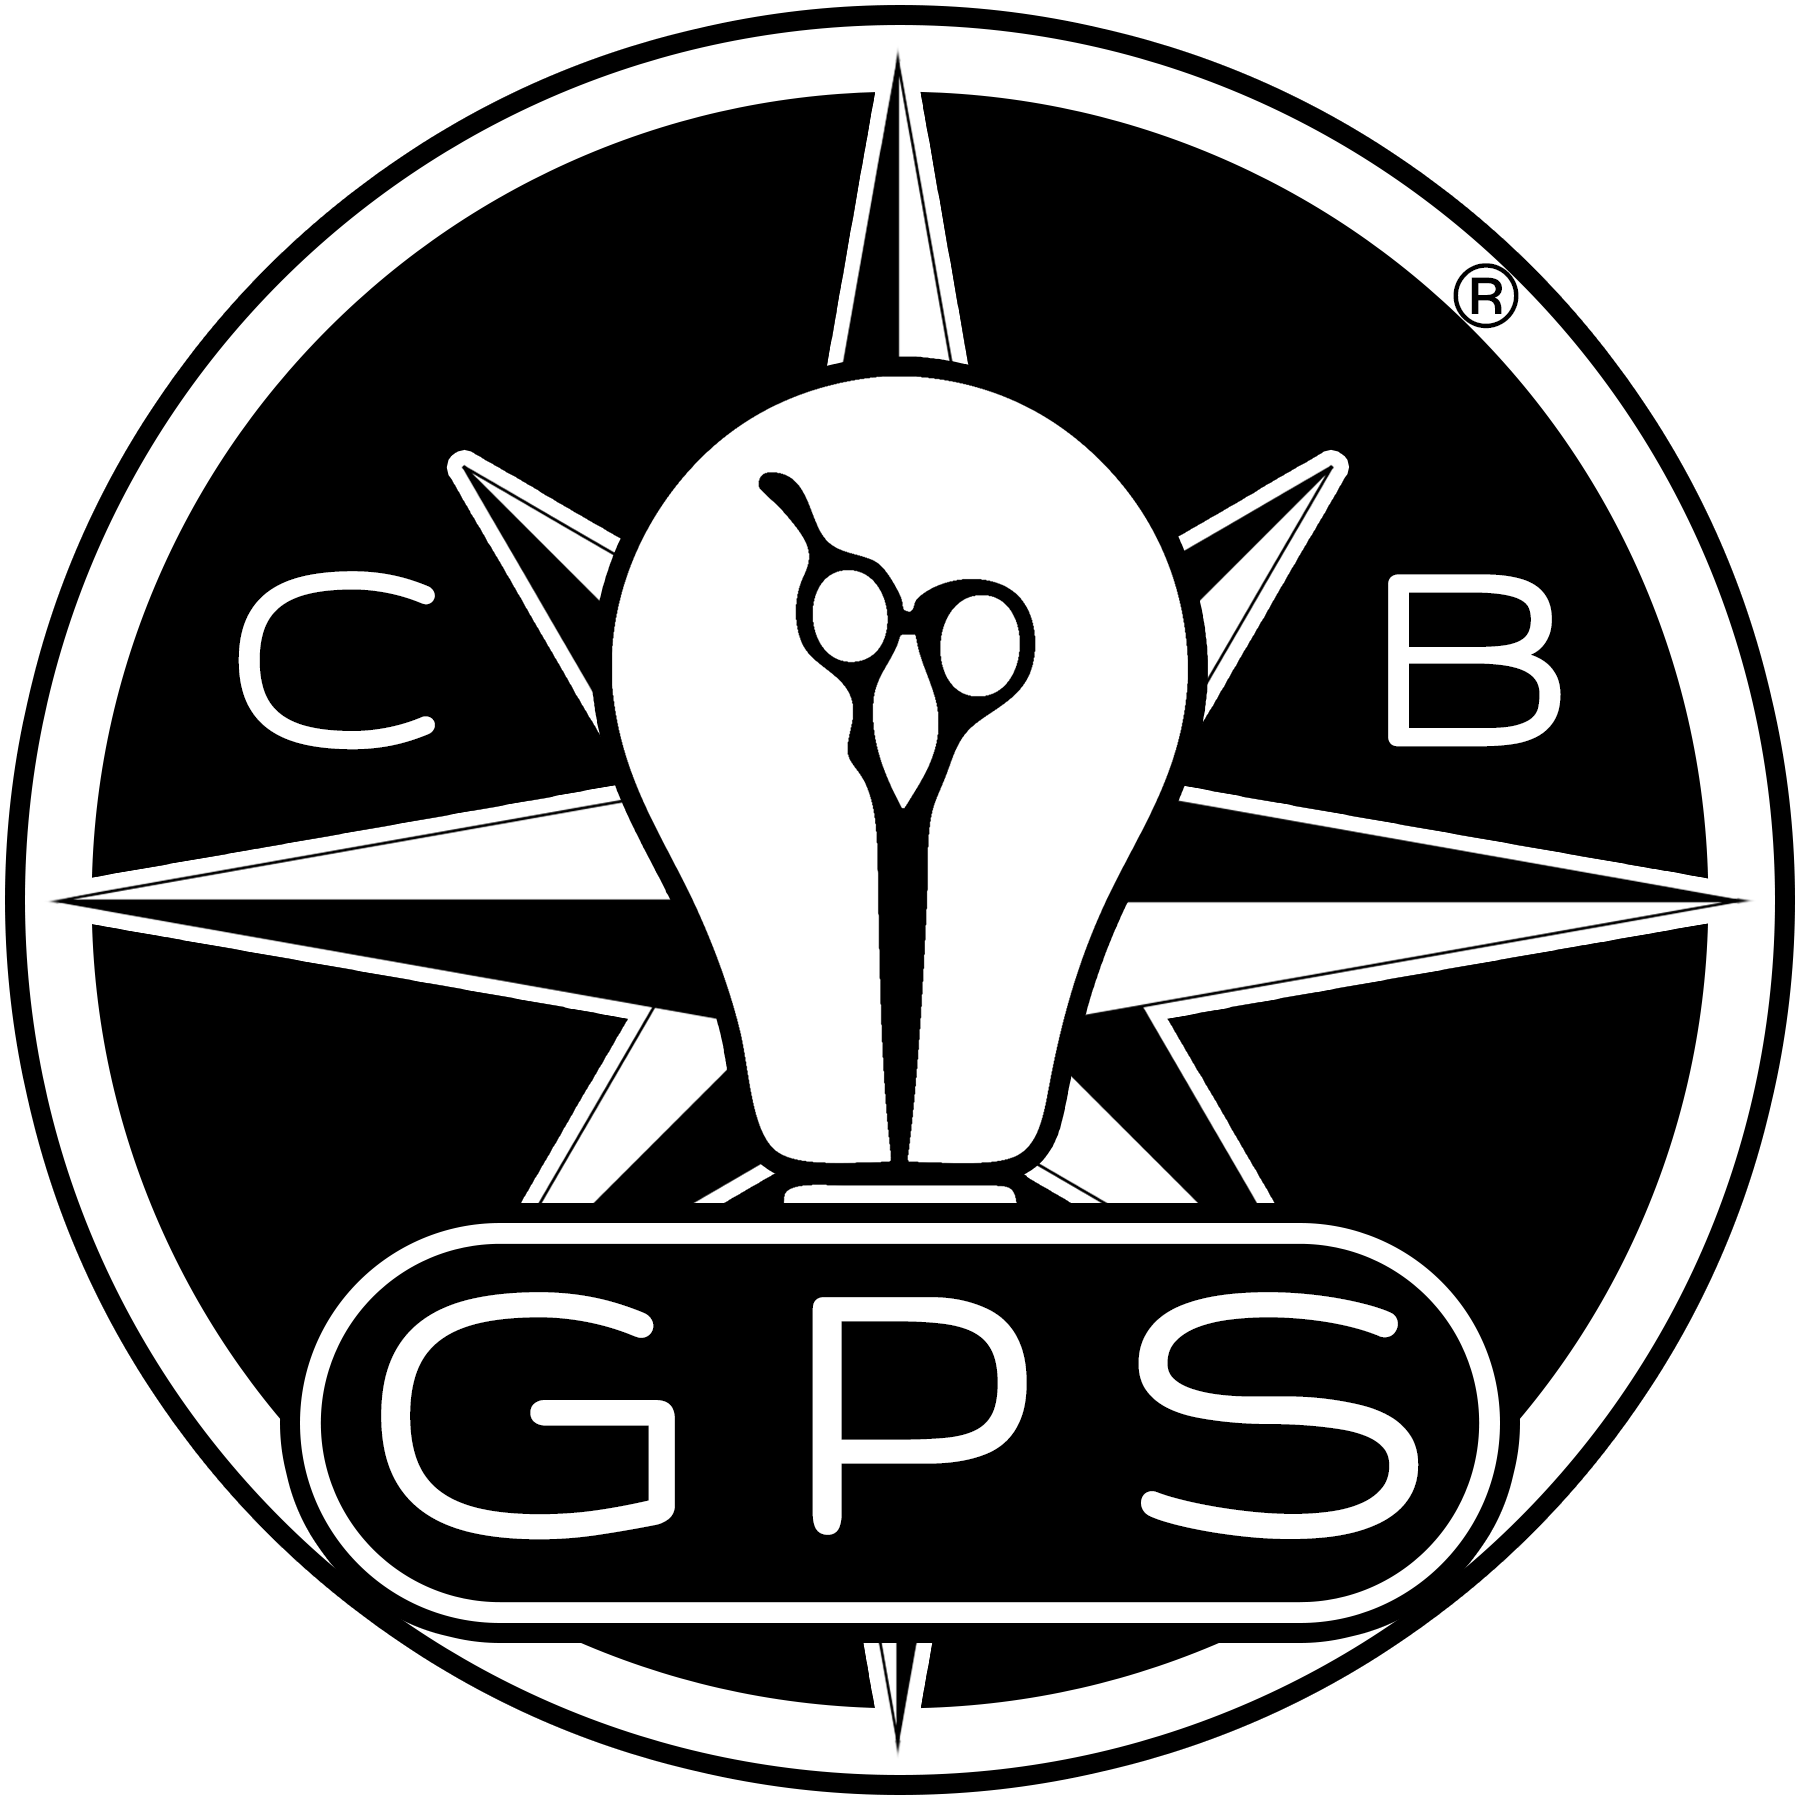 Chris Baran's Global Peak-Performance System